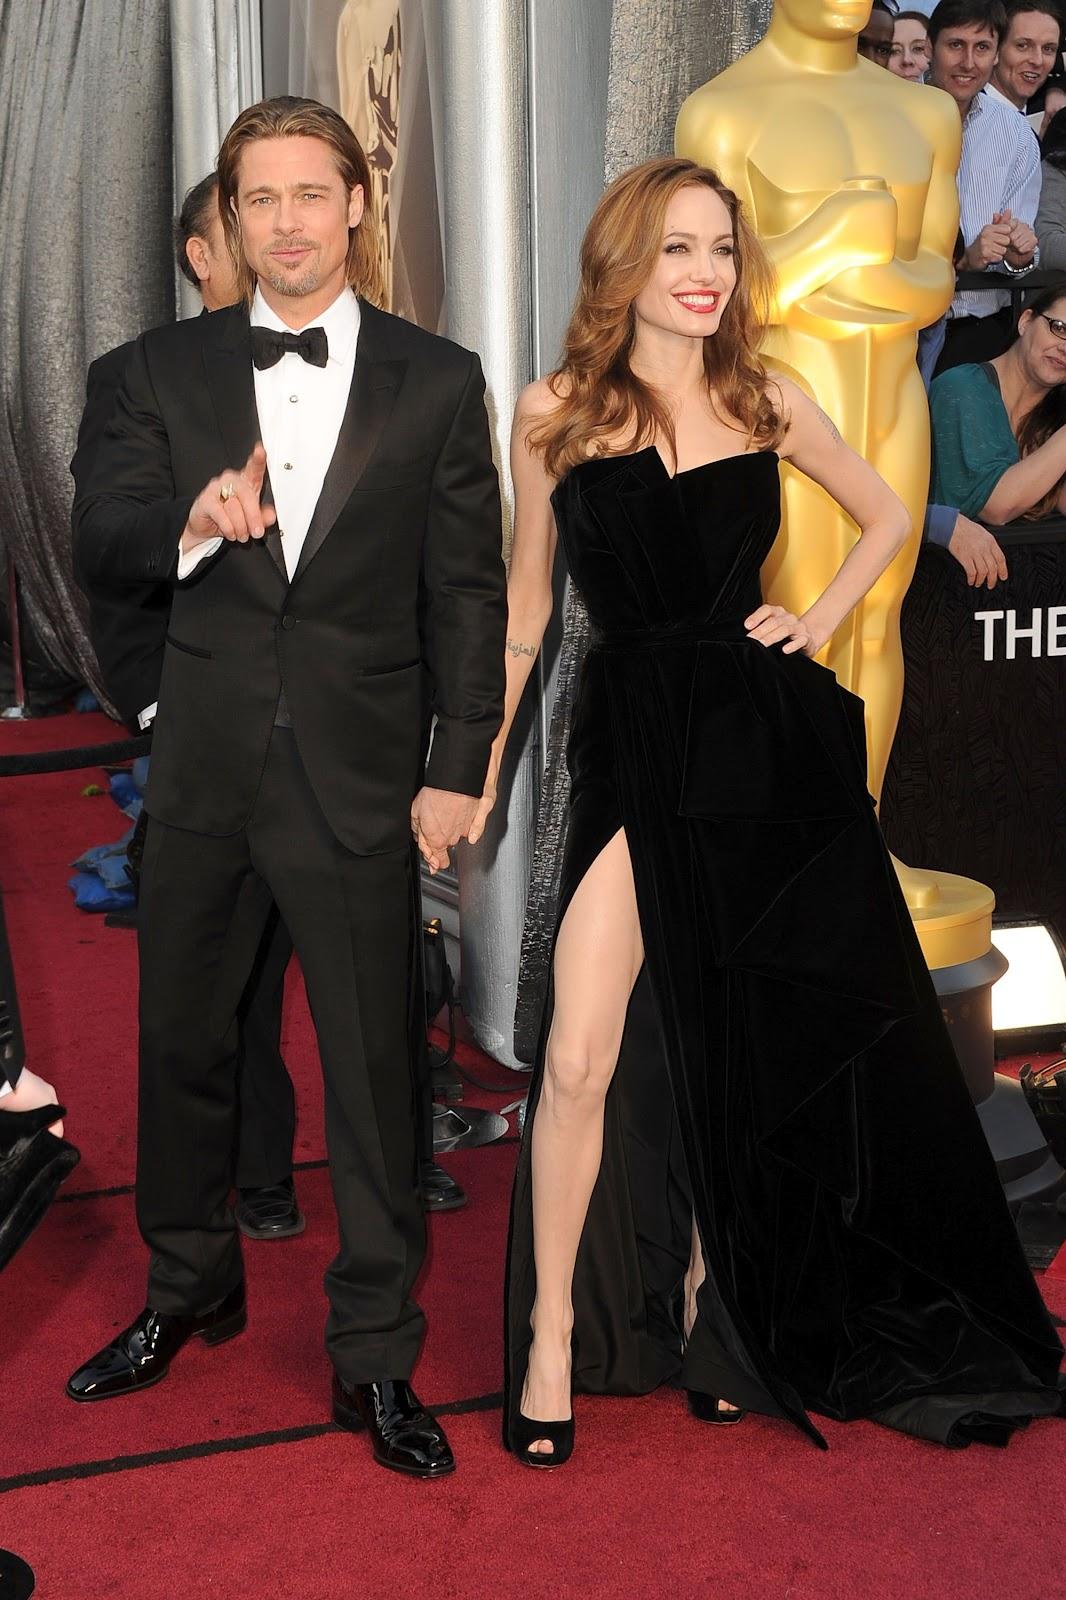 http://3.bp.blogspot.com/-kkcS5hHpJWI/T4pxQkYoF5I/AAAAAAAAAI0/xj0UBX3n85w/s1600/Angelina+Jolie+Oscars+2012.jpg